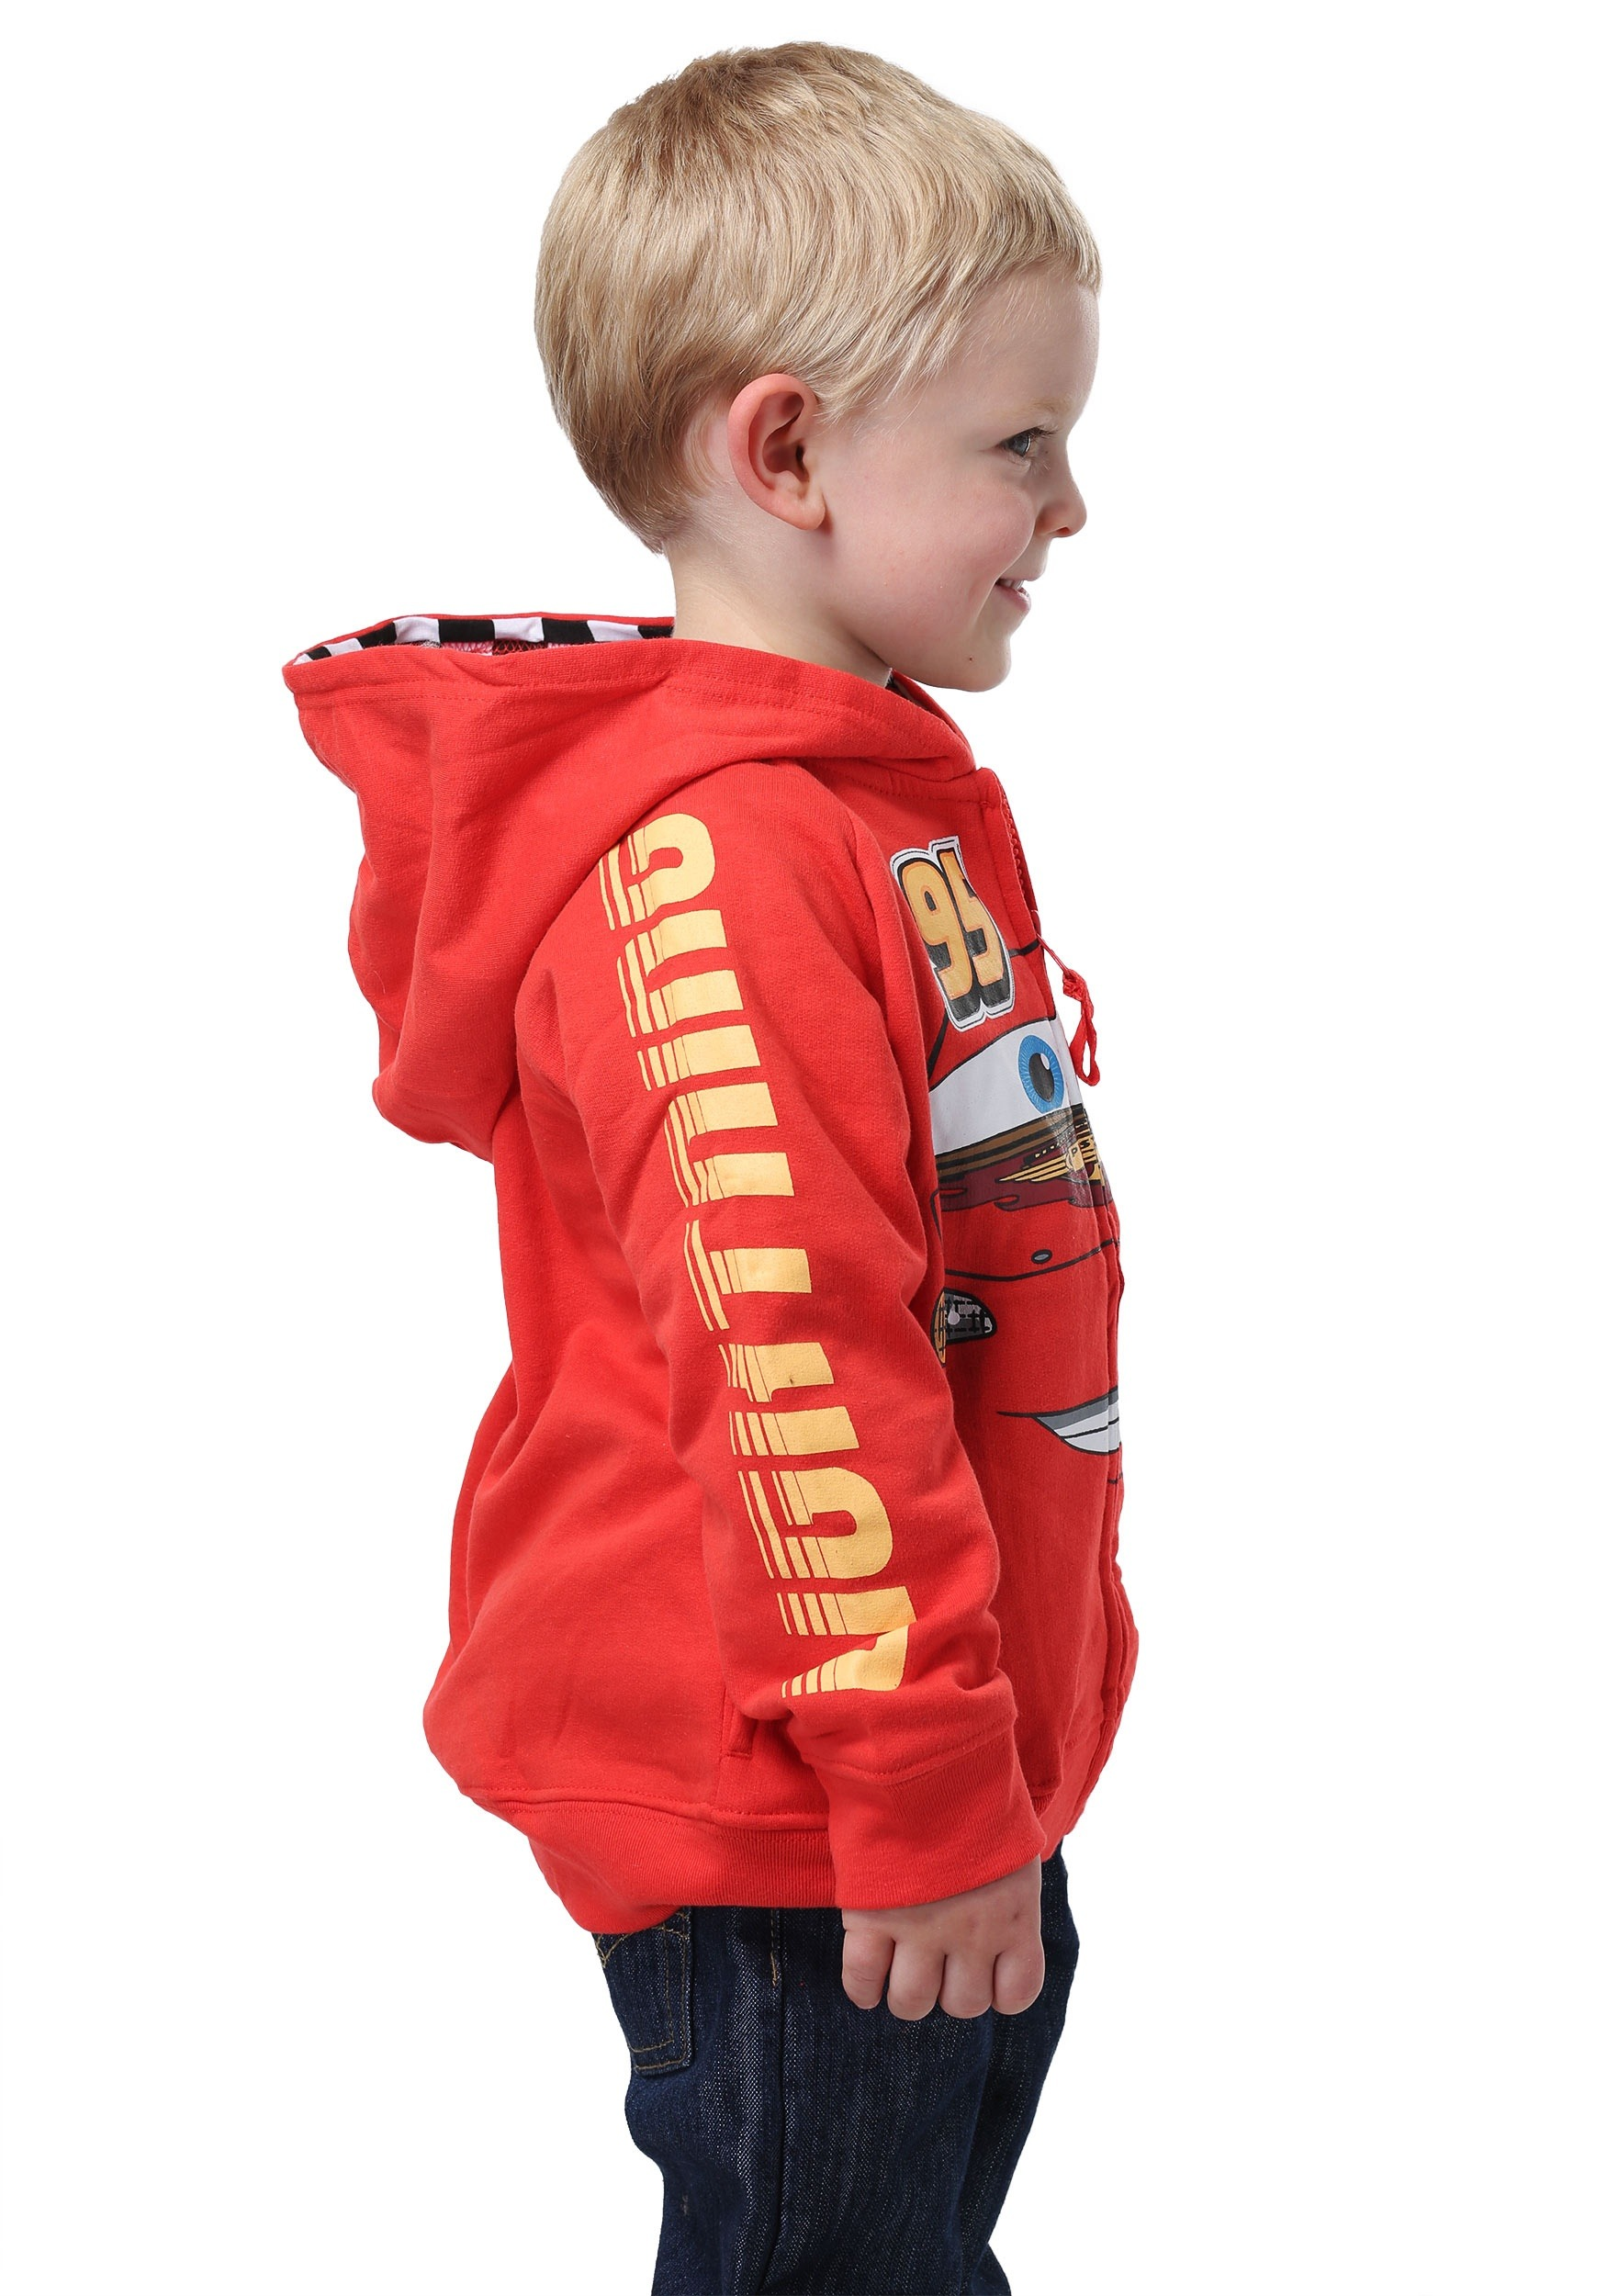 ... Disney Cars Lightning McQueen Kids Costume Hoodie  sc 1 st  Halloween Costumes & Disney Cars Lightning McQueen Costume Hoodie for Kids